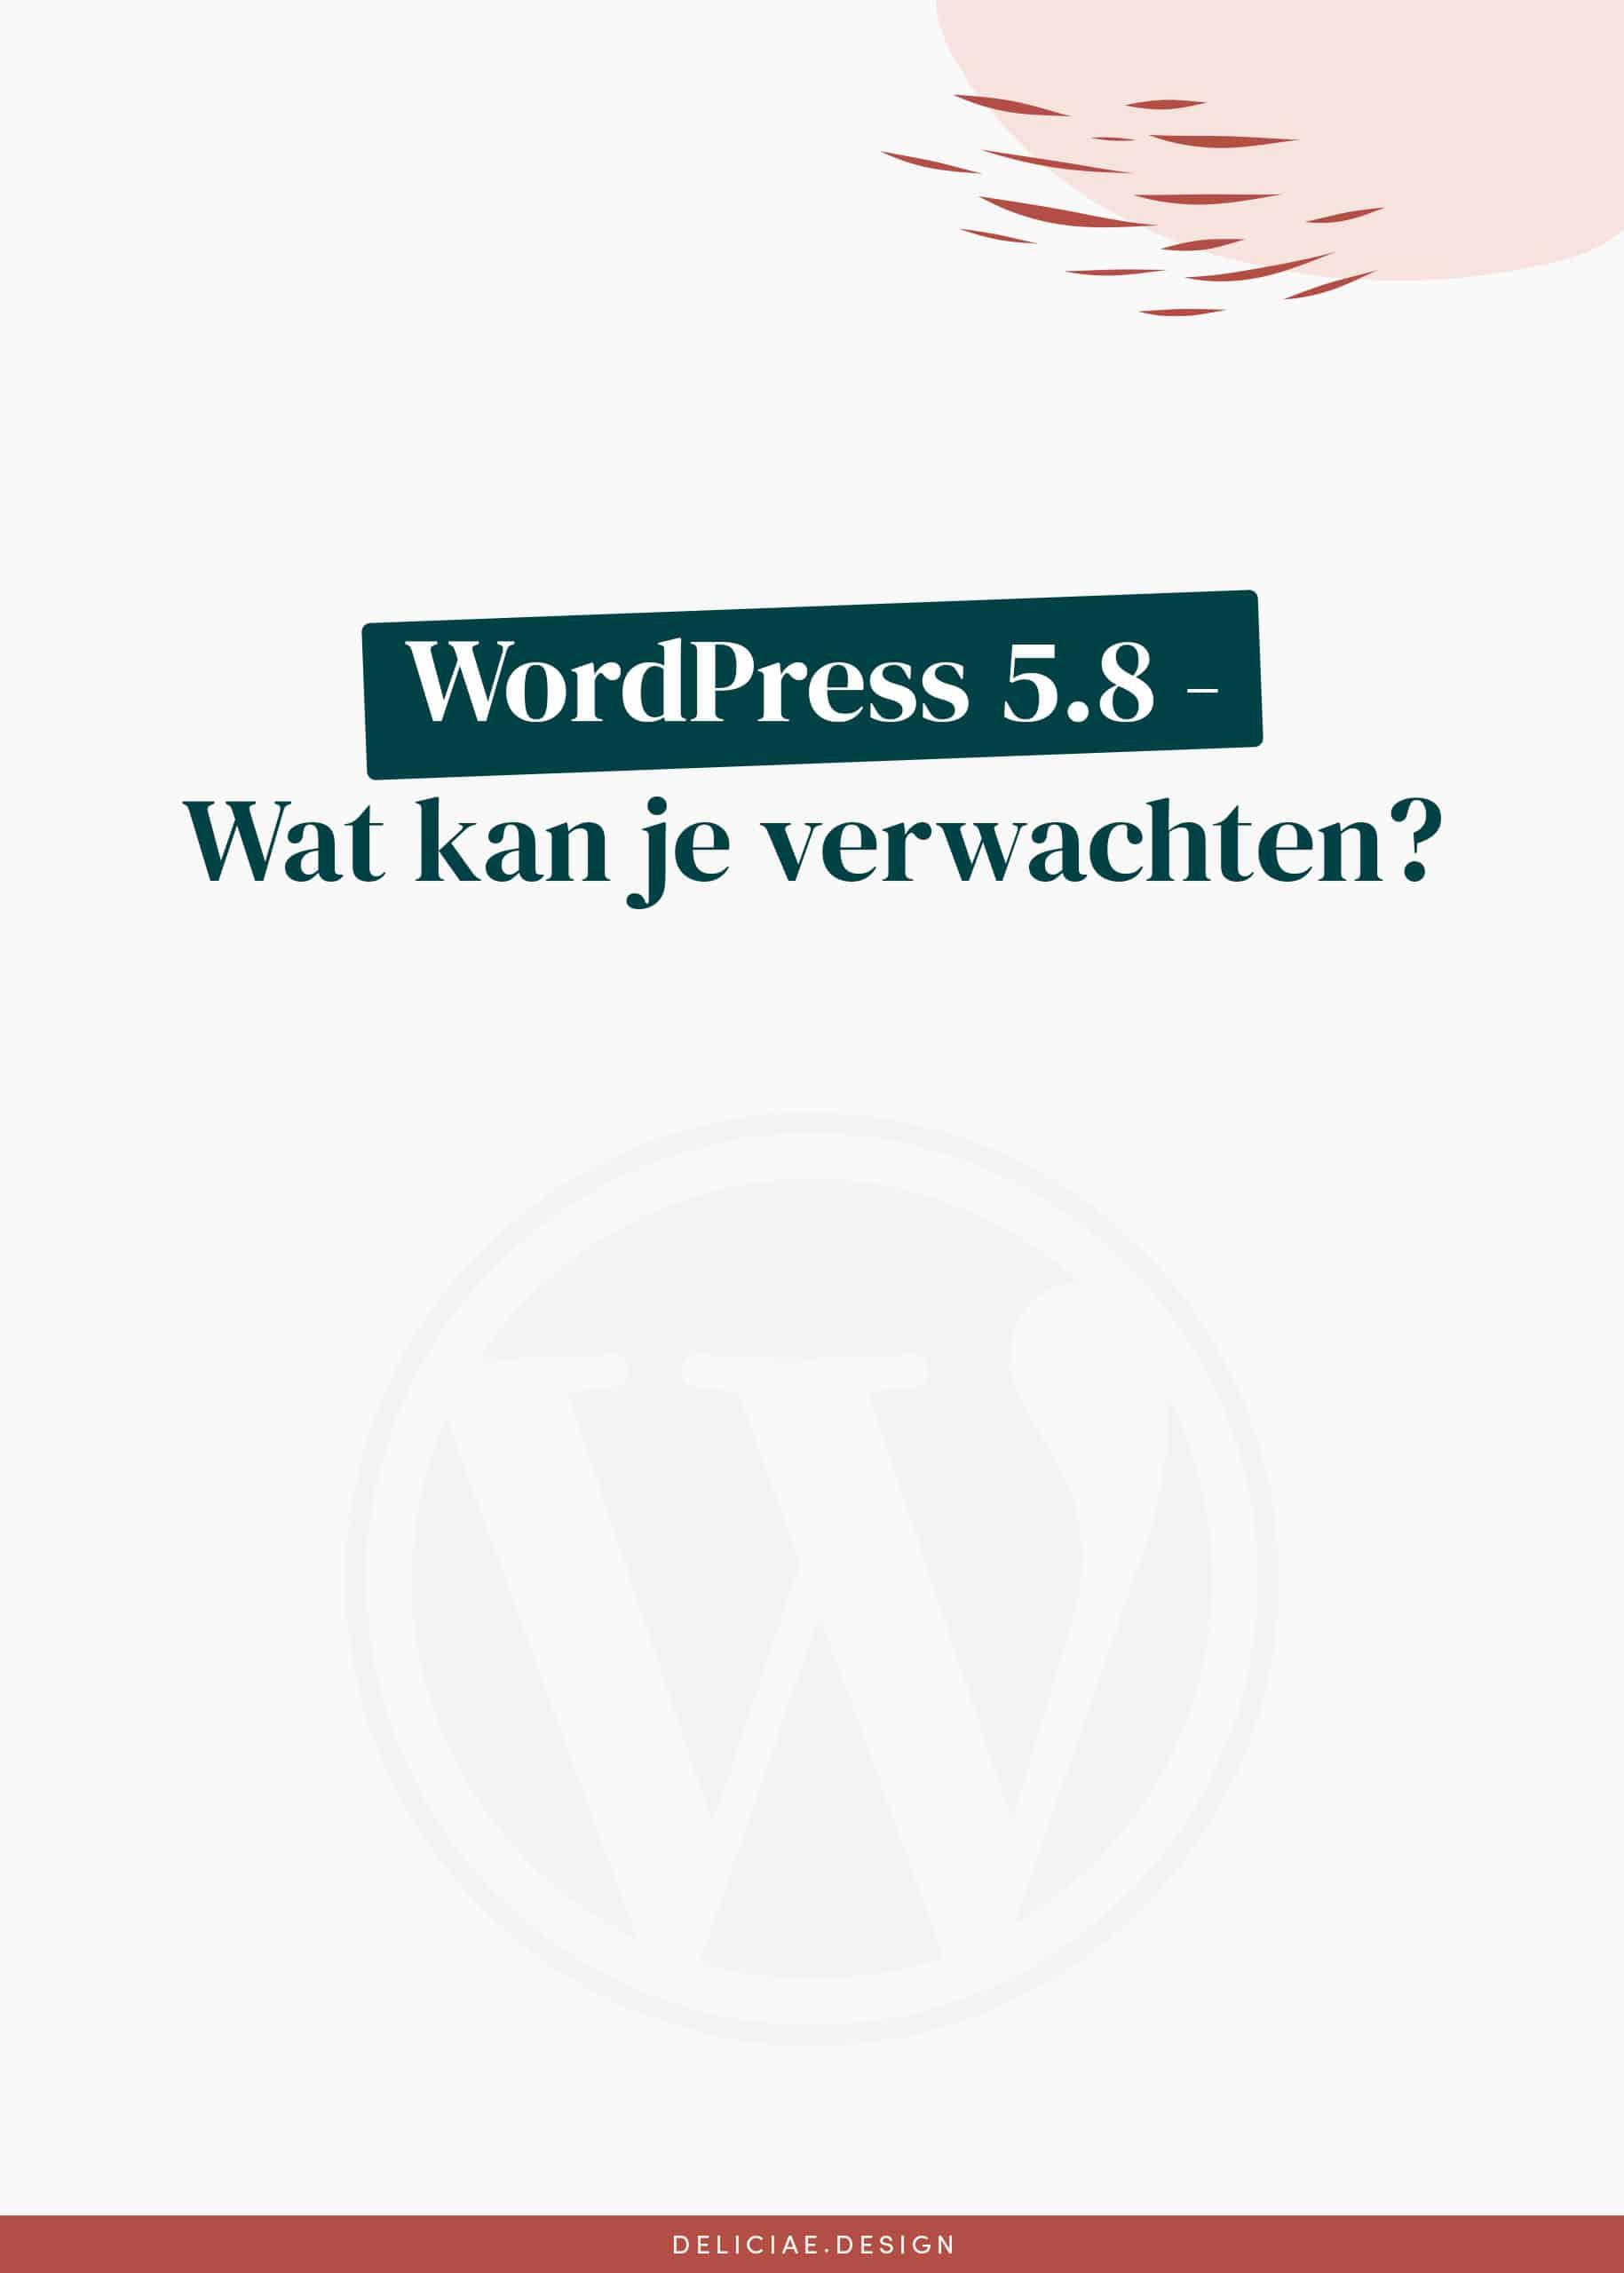 wordpress-5.8